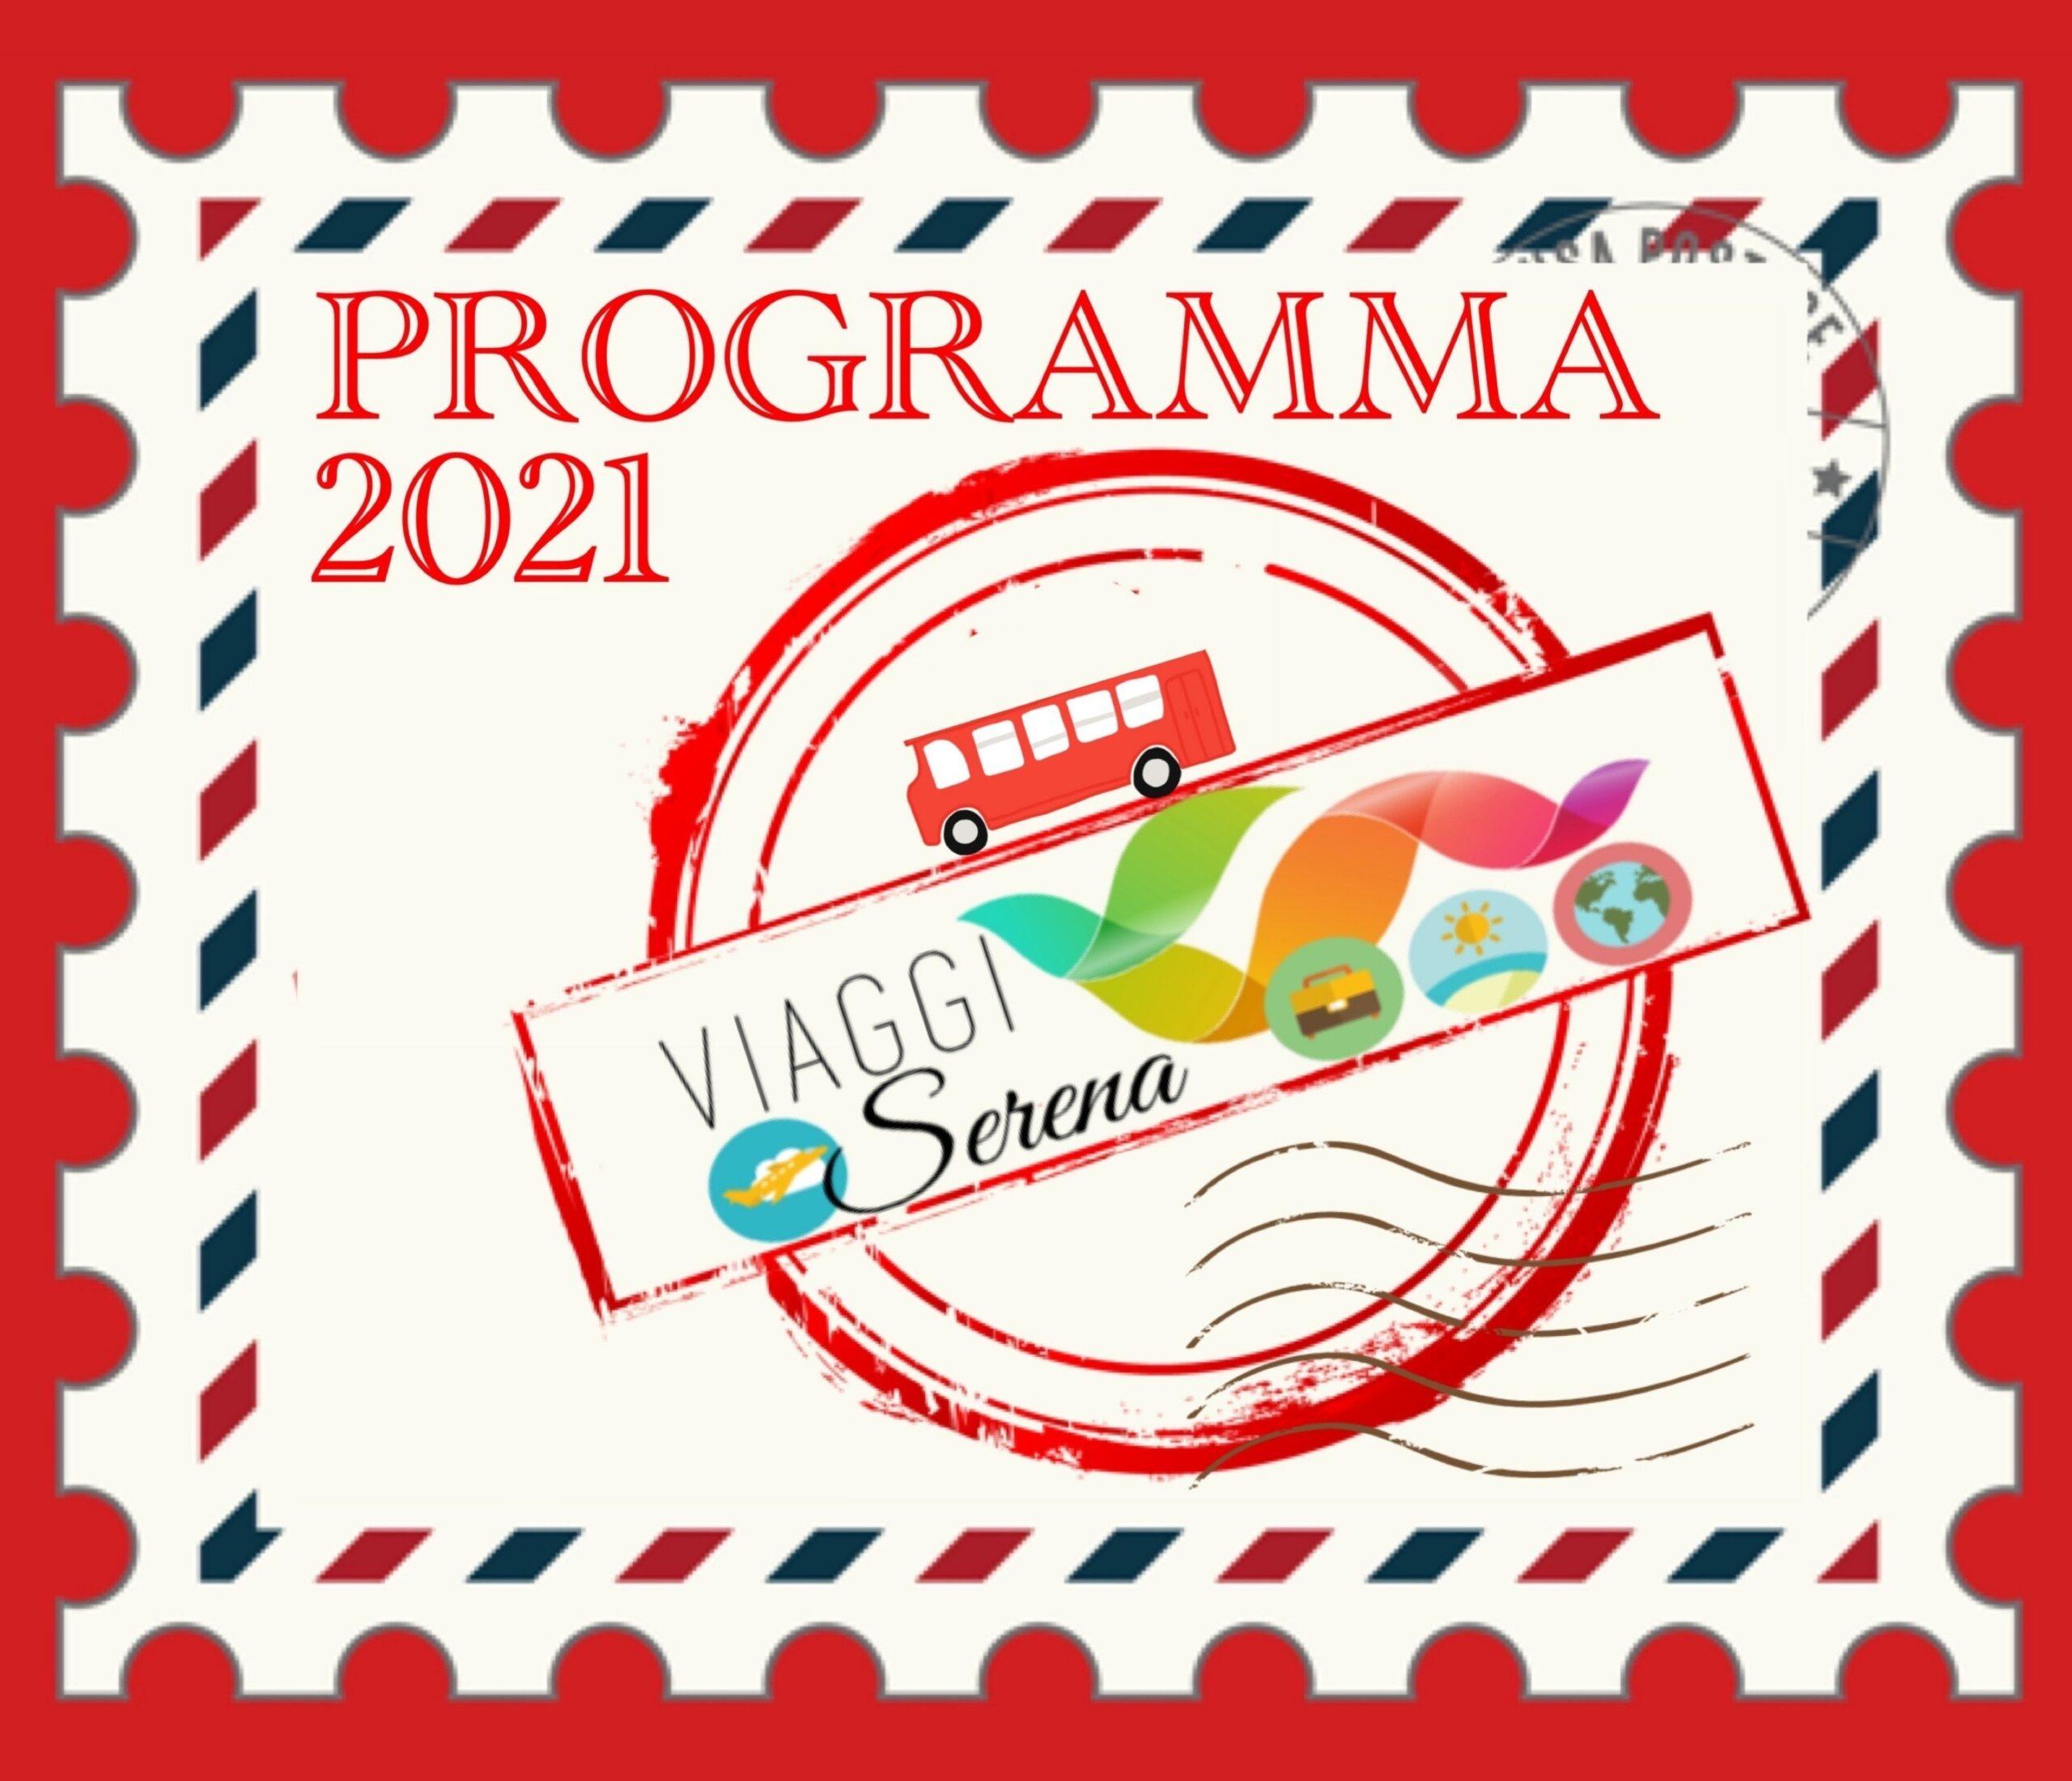 PROGRAMMA 2021!!!